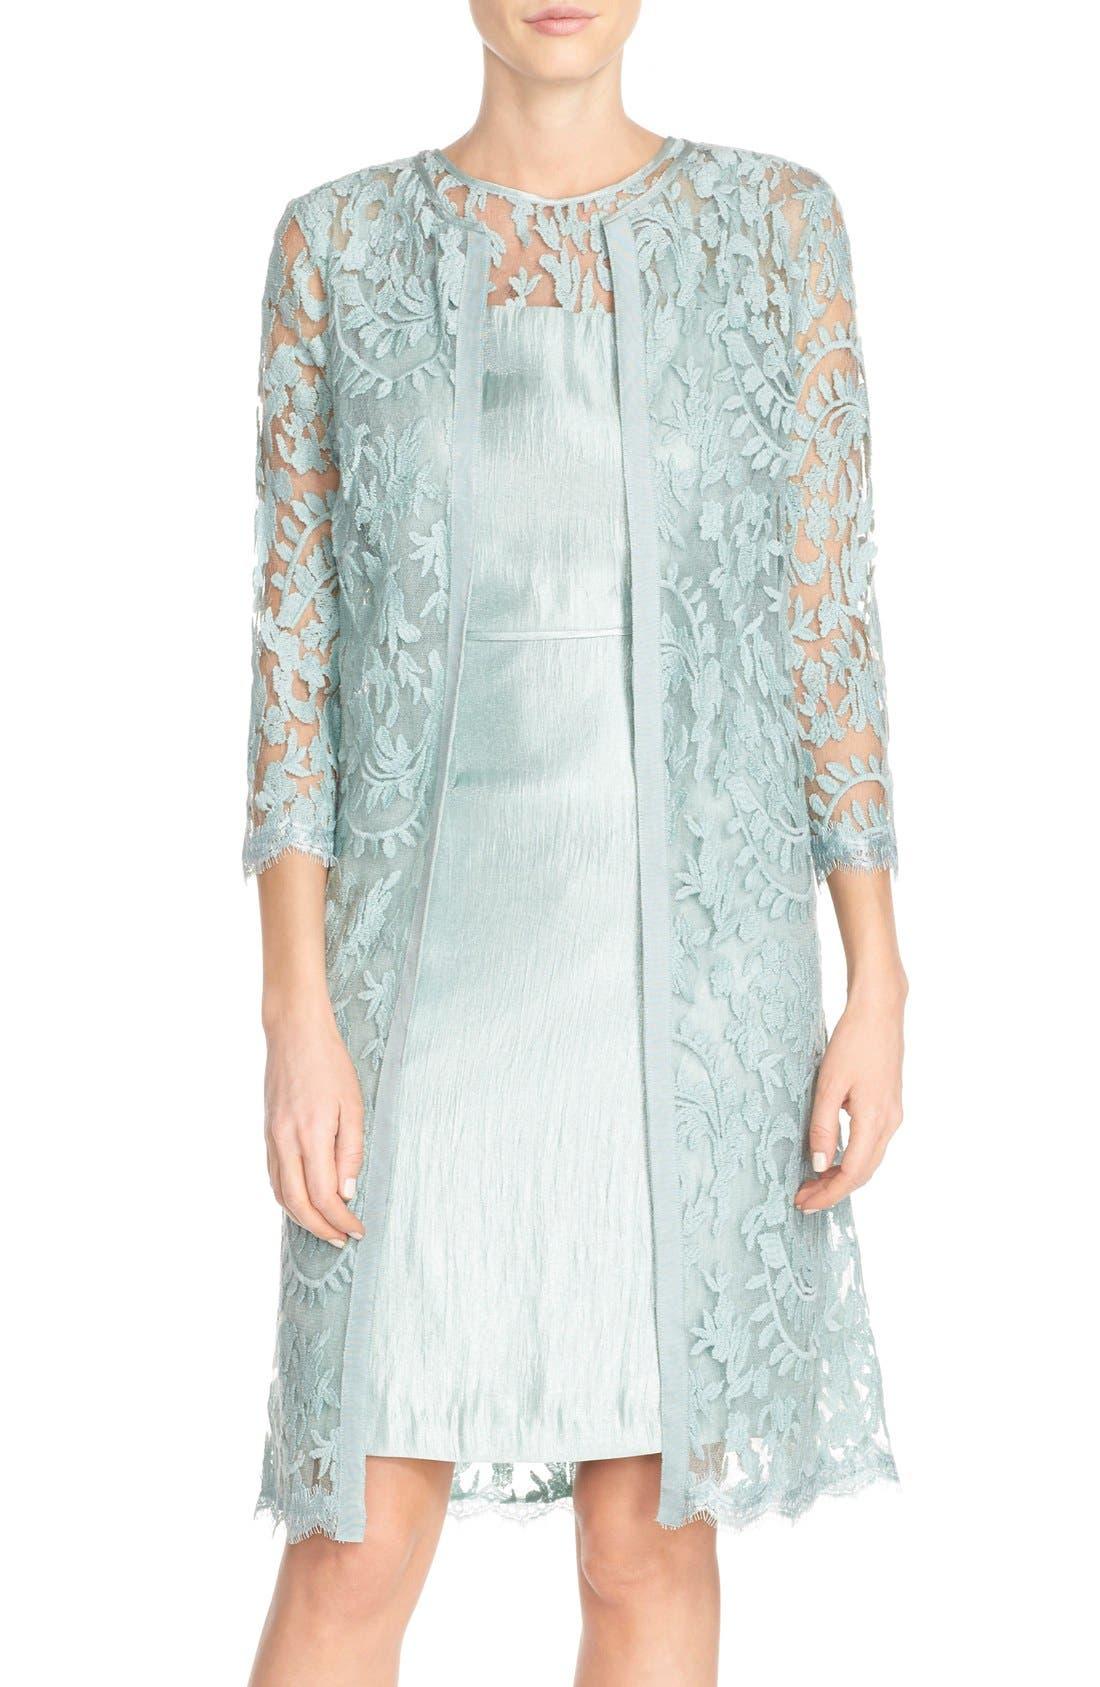 Alternate Image 1 Selected - Adrianna PapellEmbroidered Lace Illusion Yoke Sheath Dress &Topper (Regular & Petite)